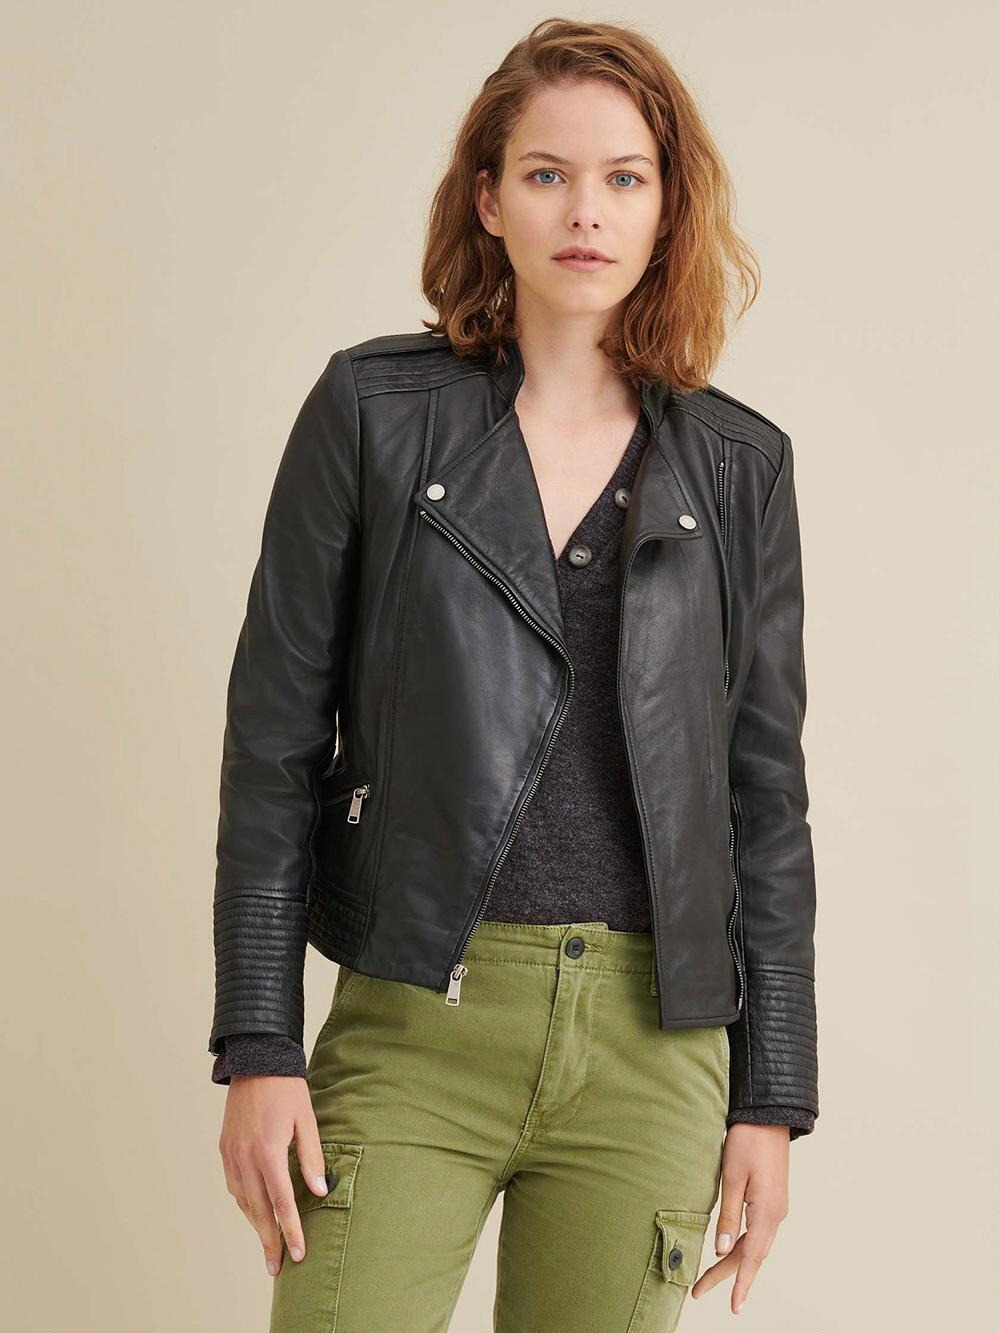 Monica Asymmetrical Leather Jacket Asymmetrical leather